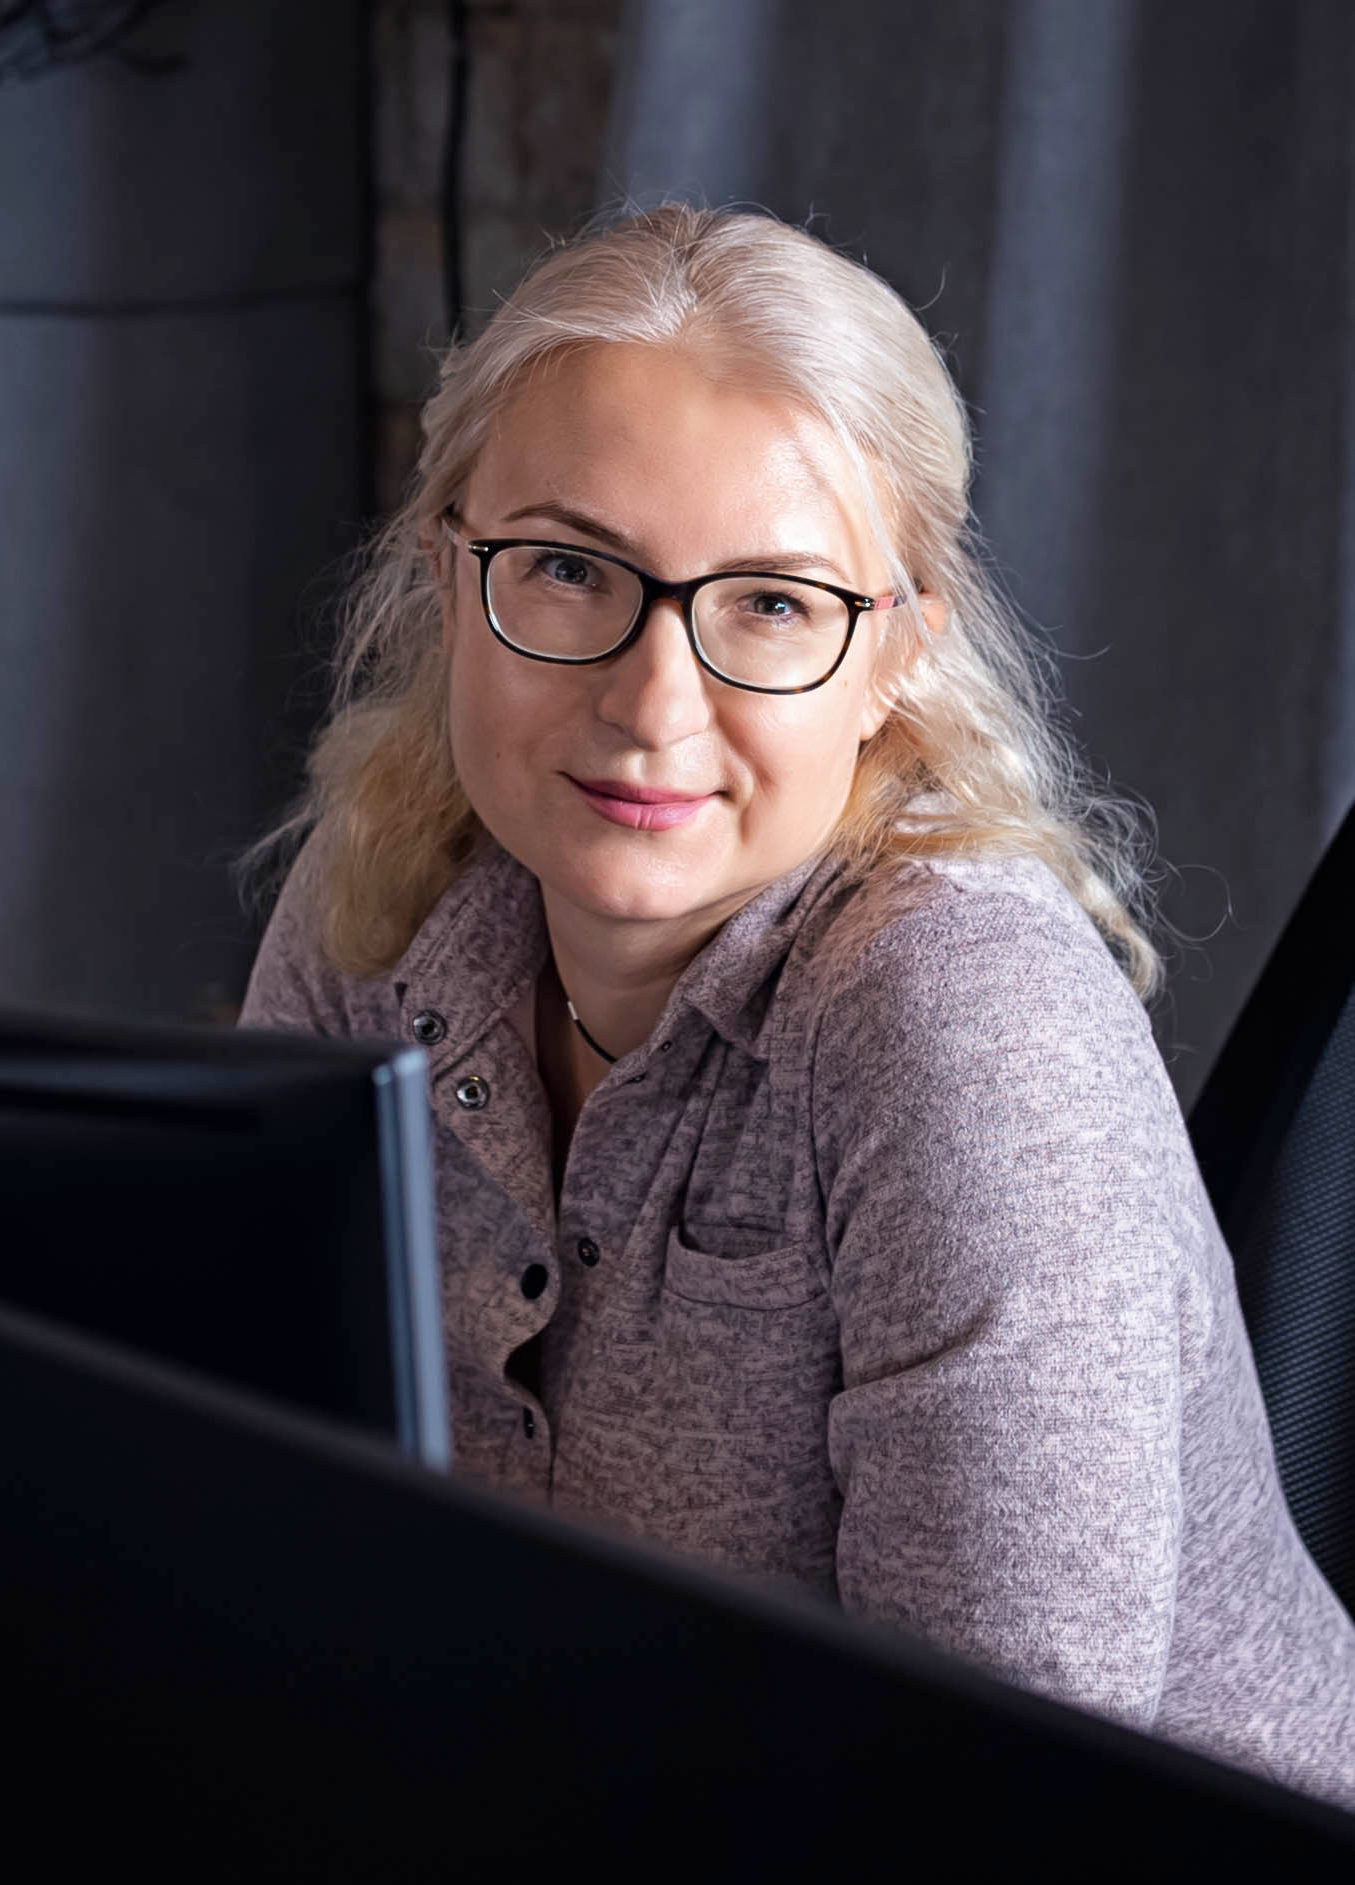 Светлана Звягинцева, HR-директор Frag Lab